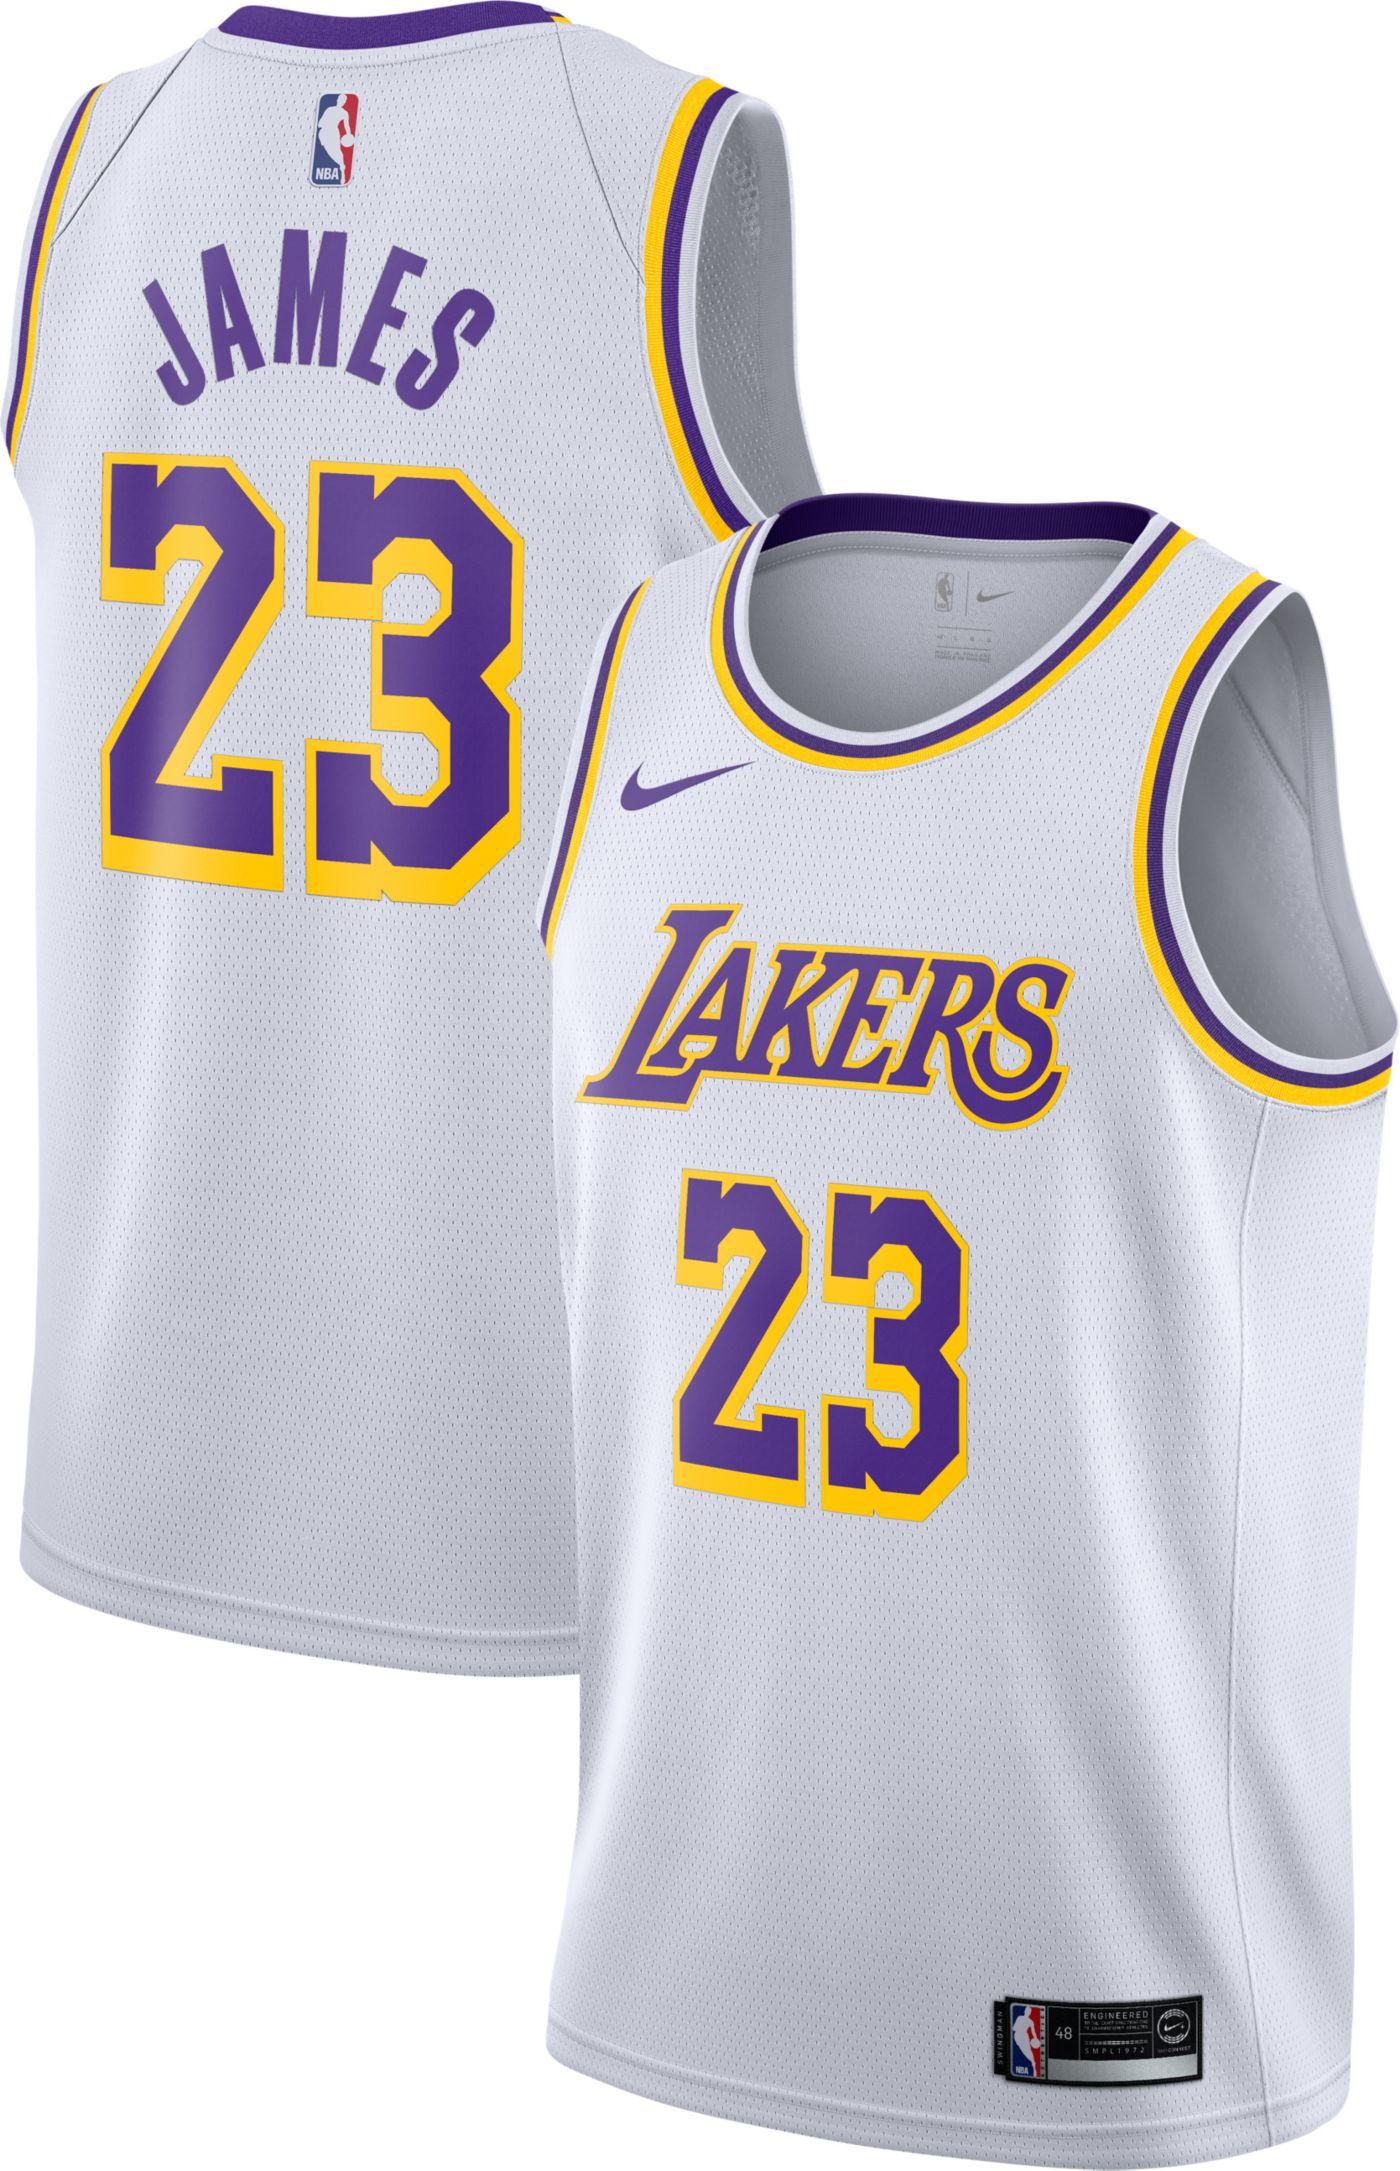 Nike Men's Los Angeles Lakers LeBron James #23 White Dri-FIT Swingman Jersey